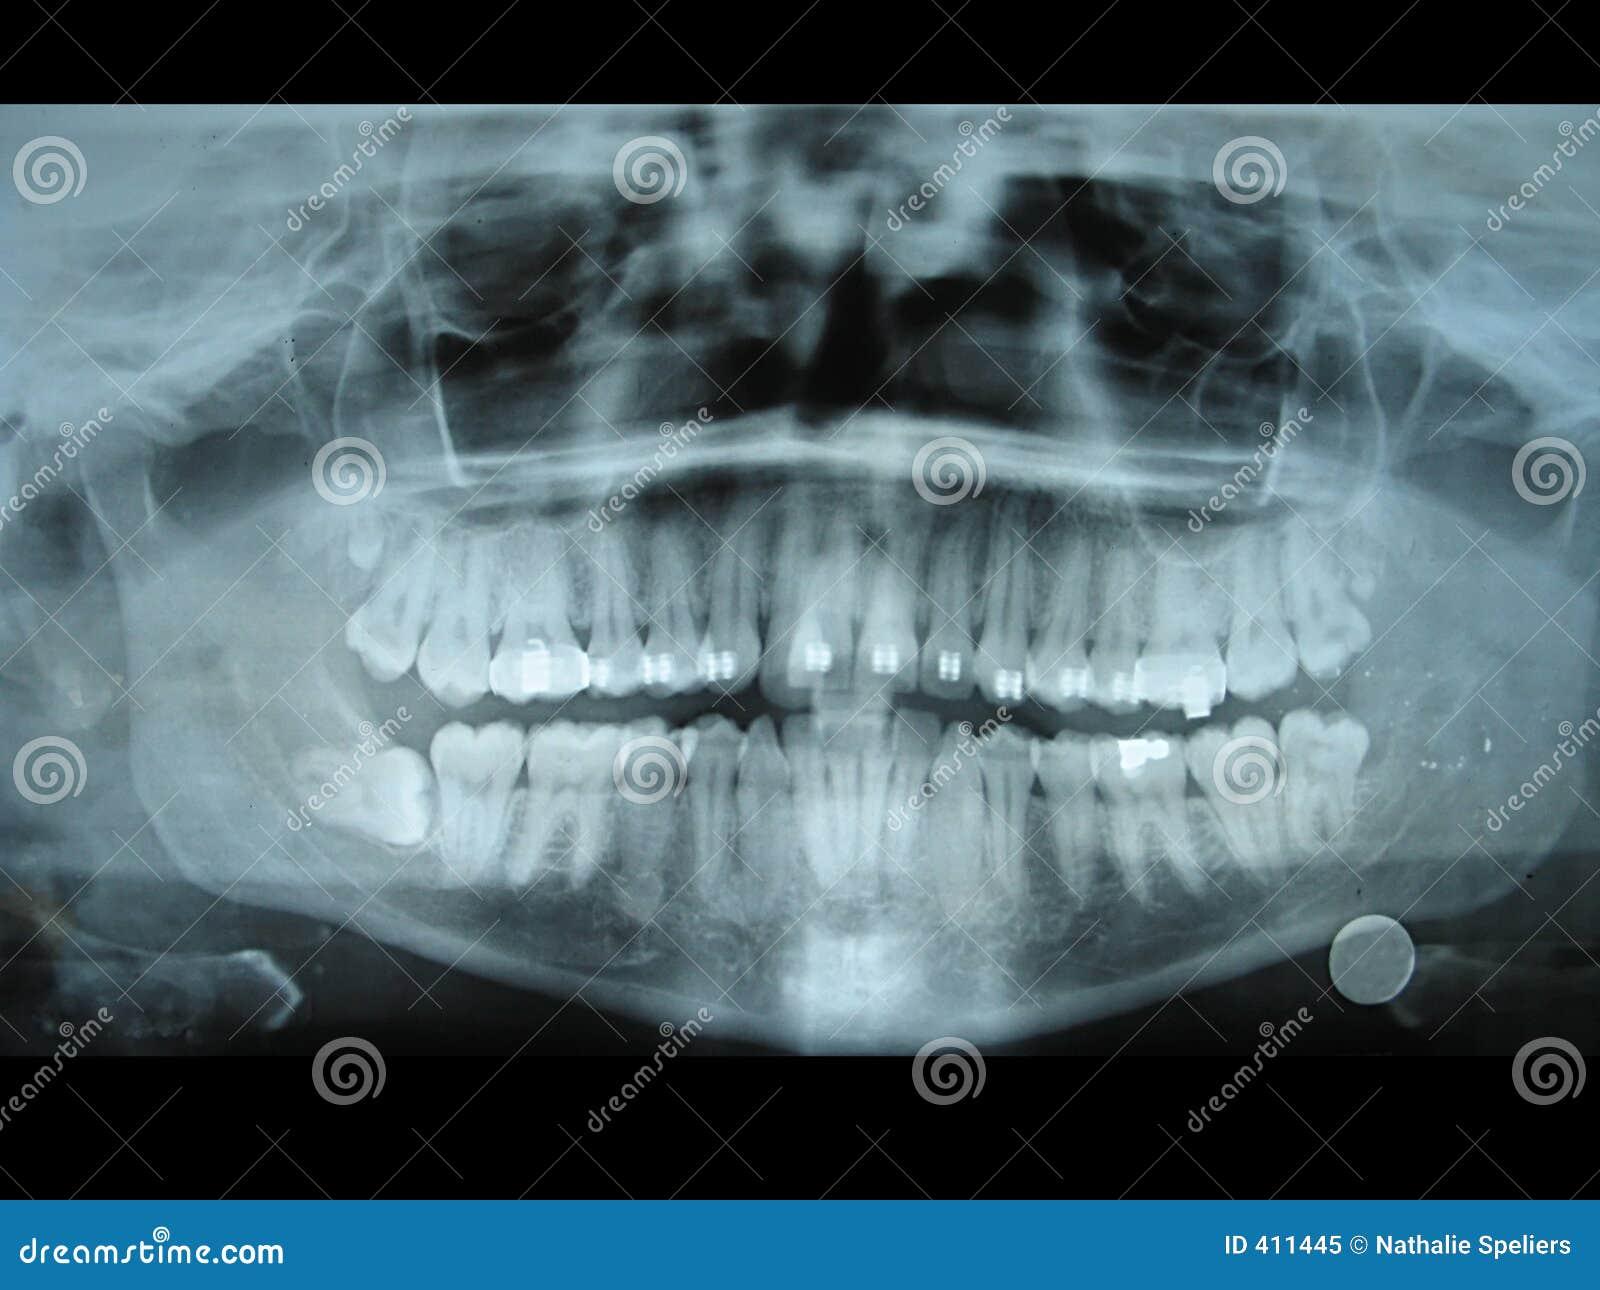 Panoramic Dental Radiology Slide Royalty Free Stock Photo - Image ...